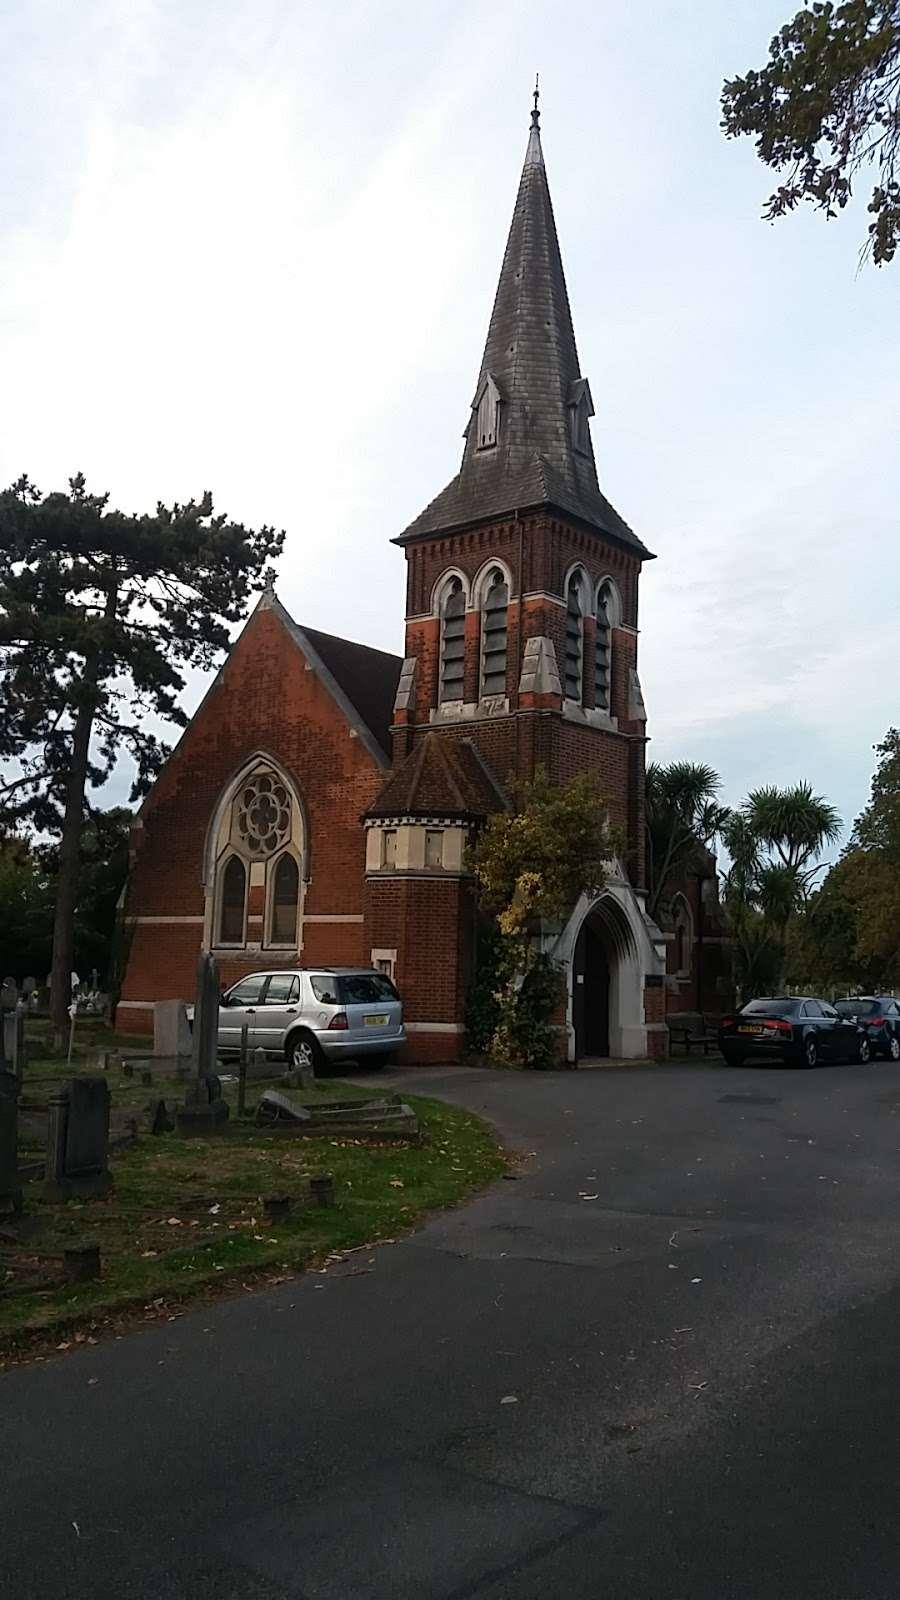 Biserica Ortodoxă Româna din sudul Londrei - church  | Photo 1 of 2 | Address: Thorthon Road, Croydon CR9 3AT, UK | Phone: 07773 277714